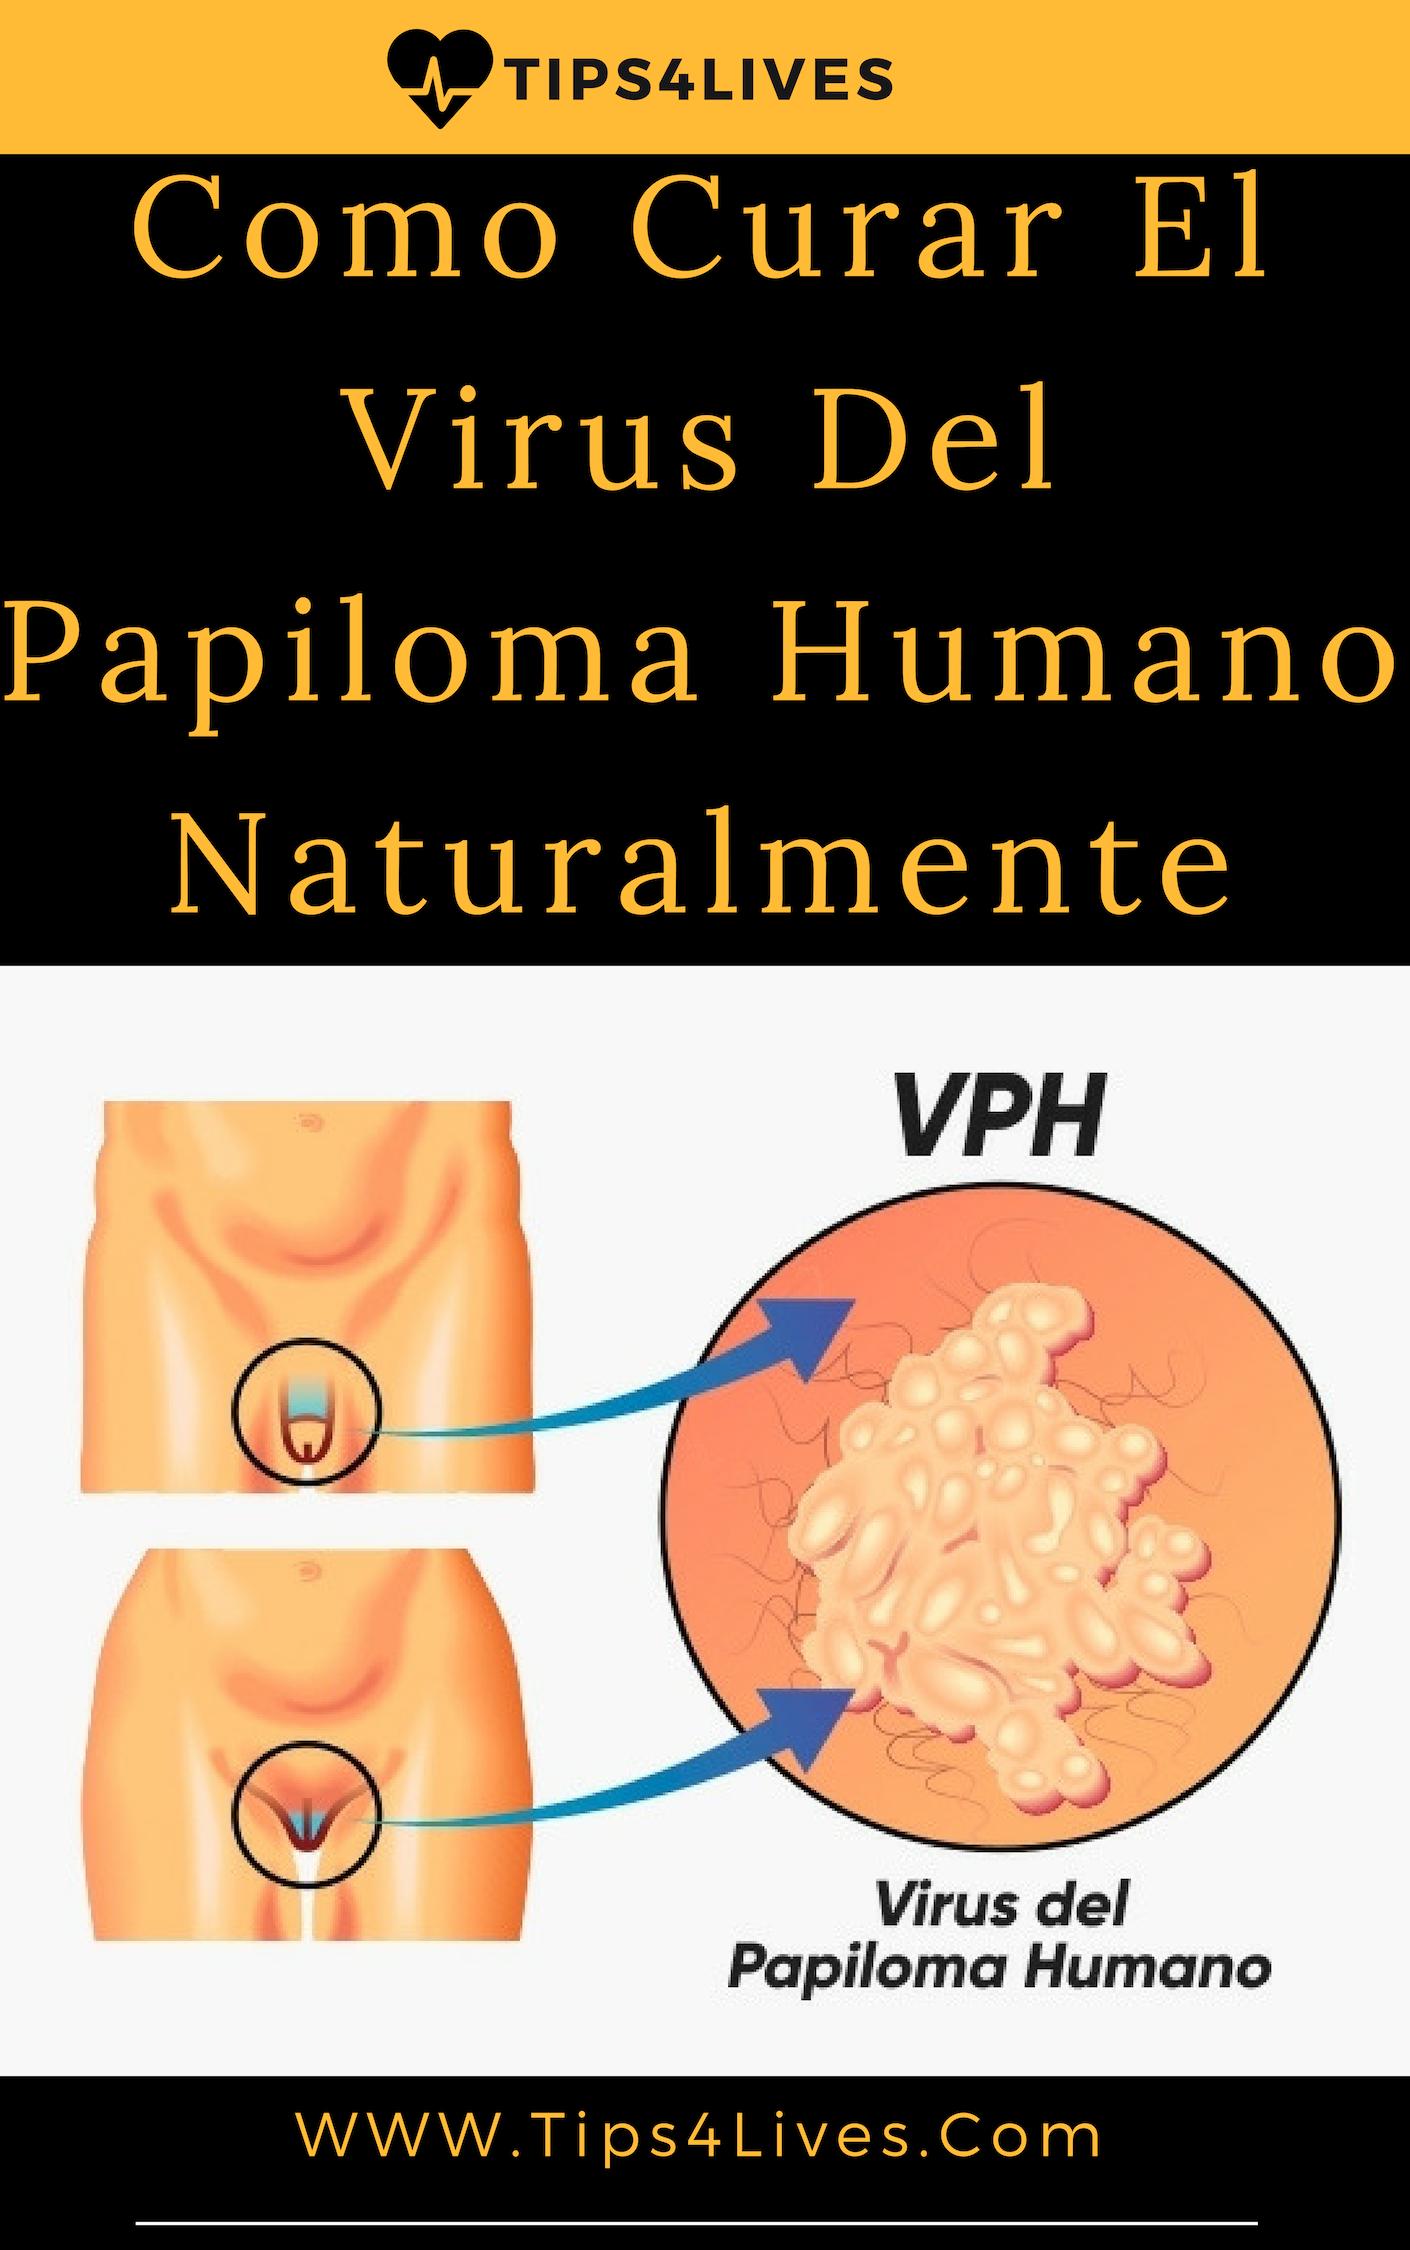 tratamiento del virus del papiloma humano